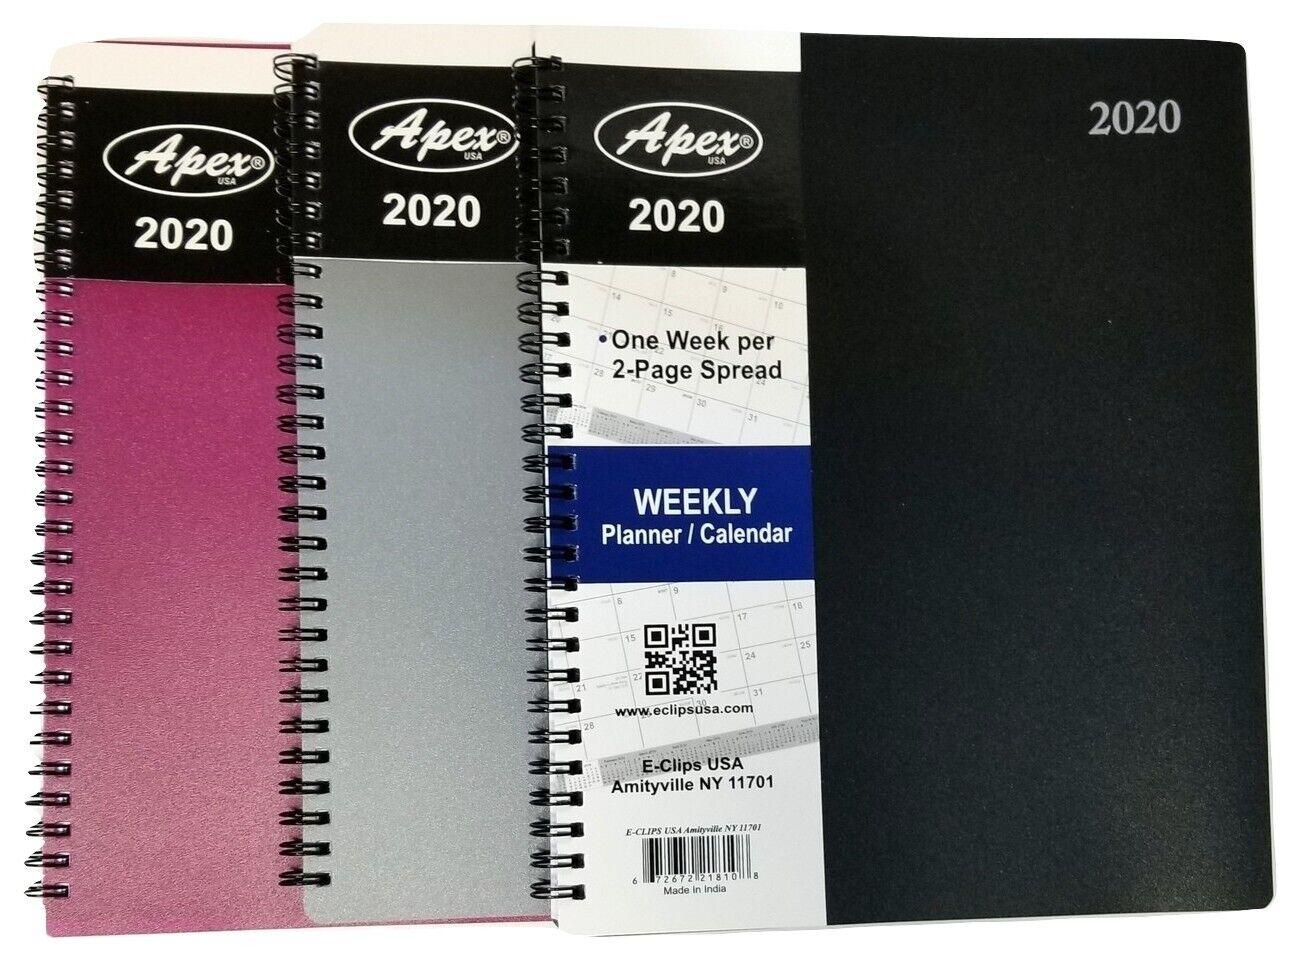 2020 weekly monthly spiral bound planner